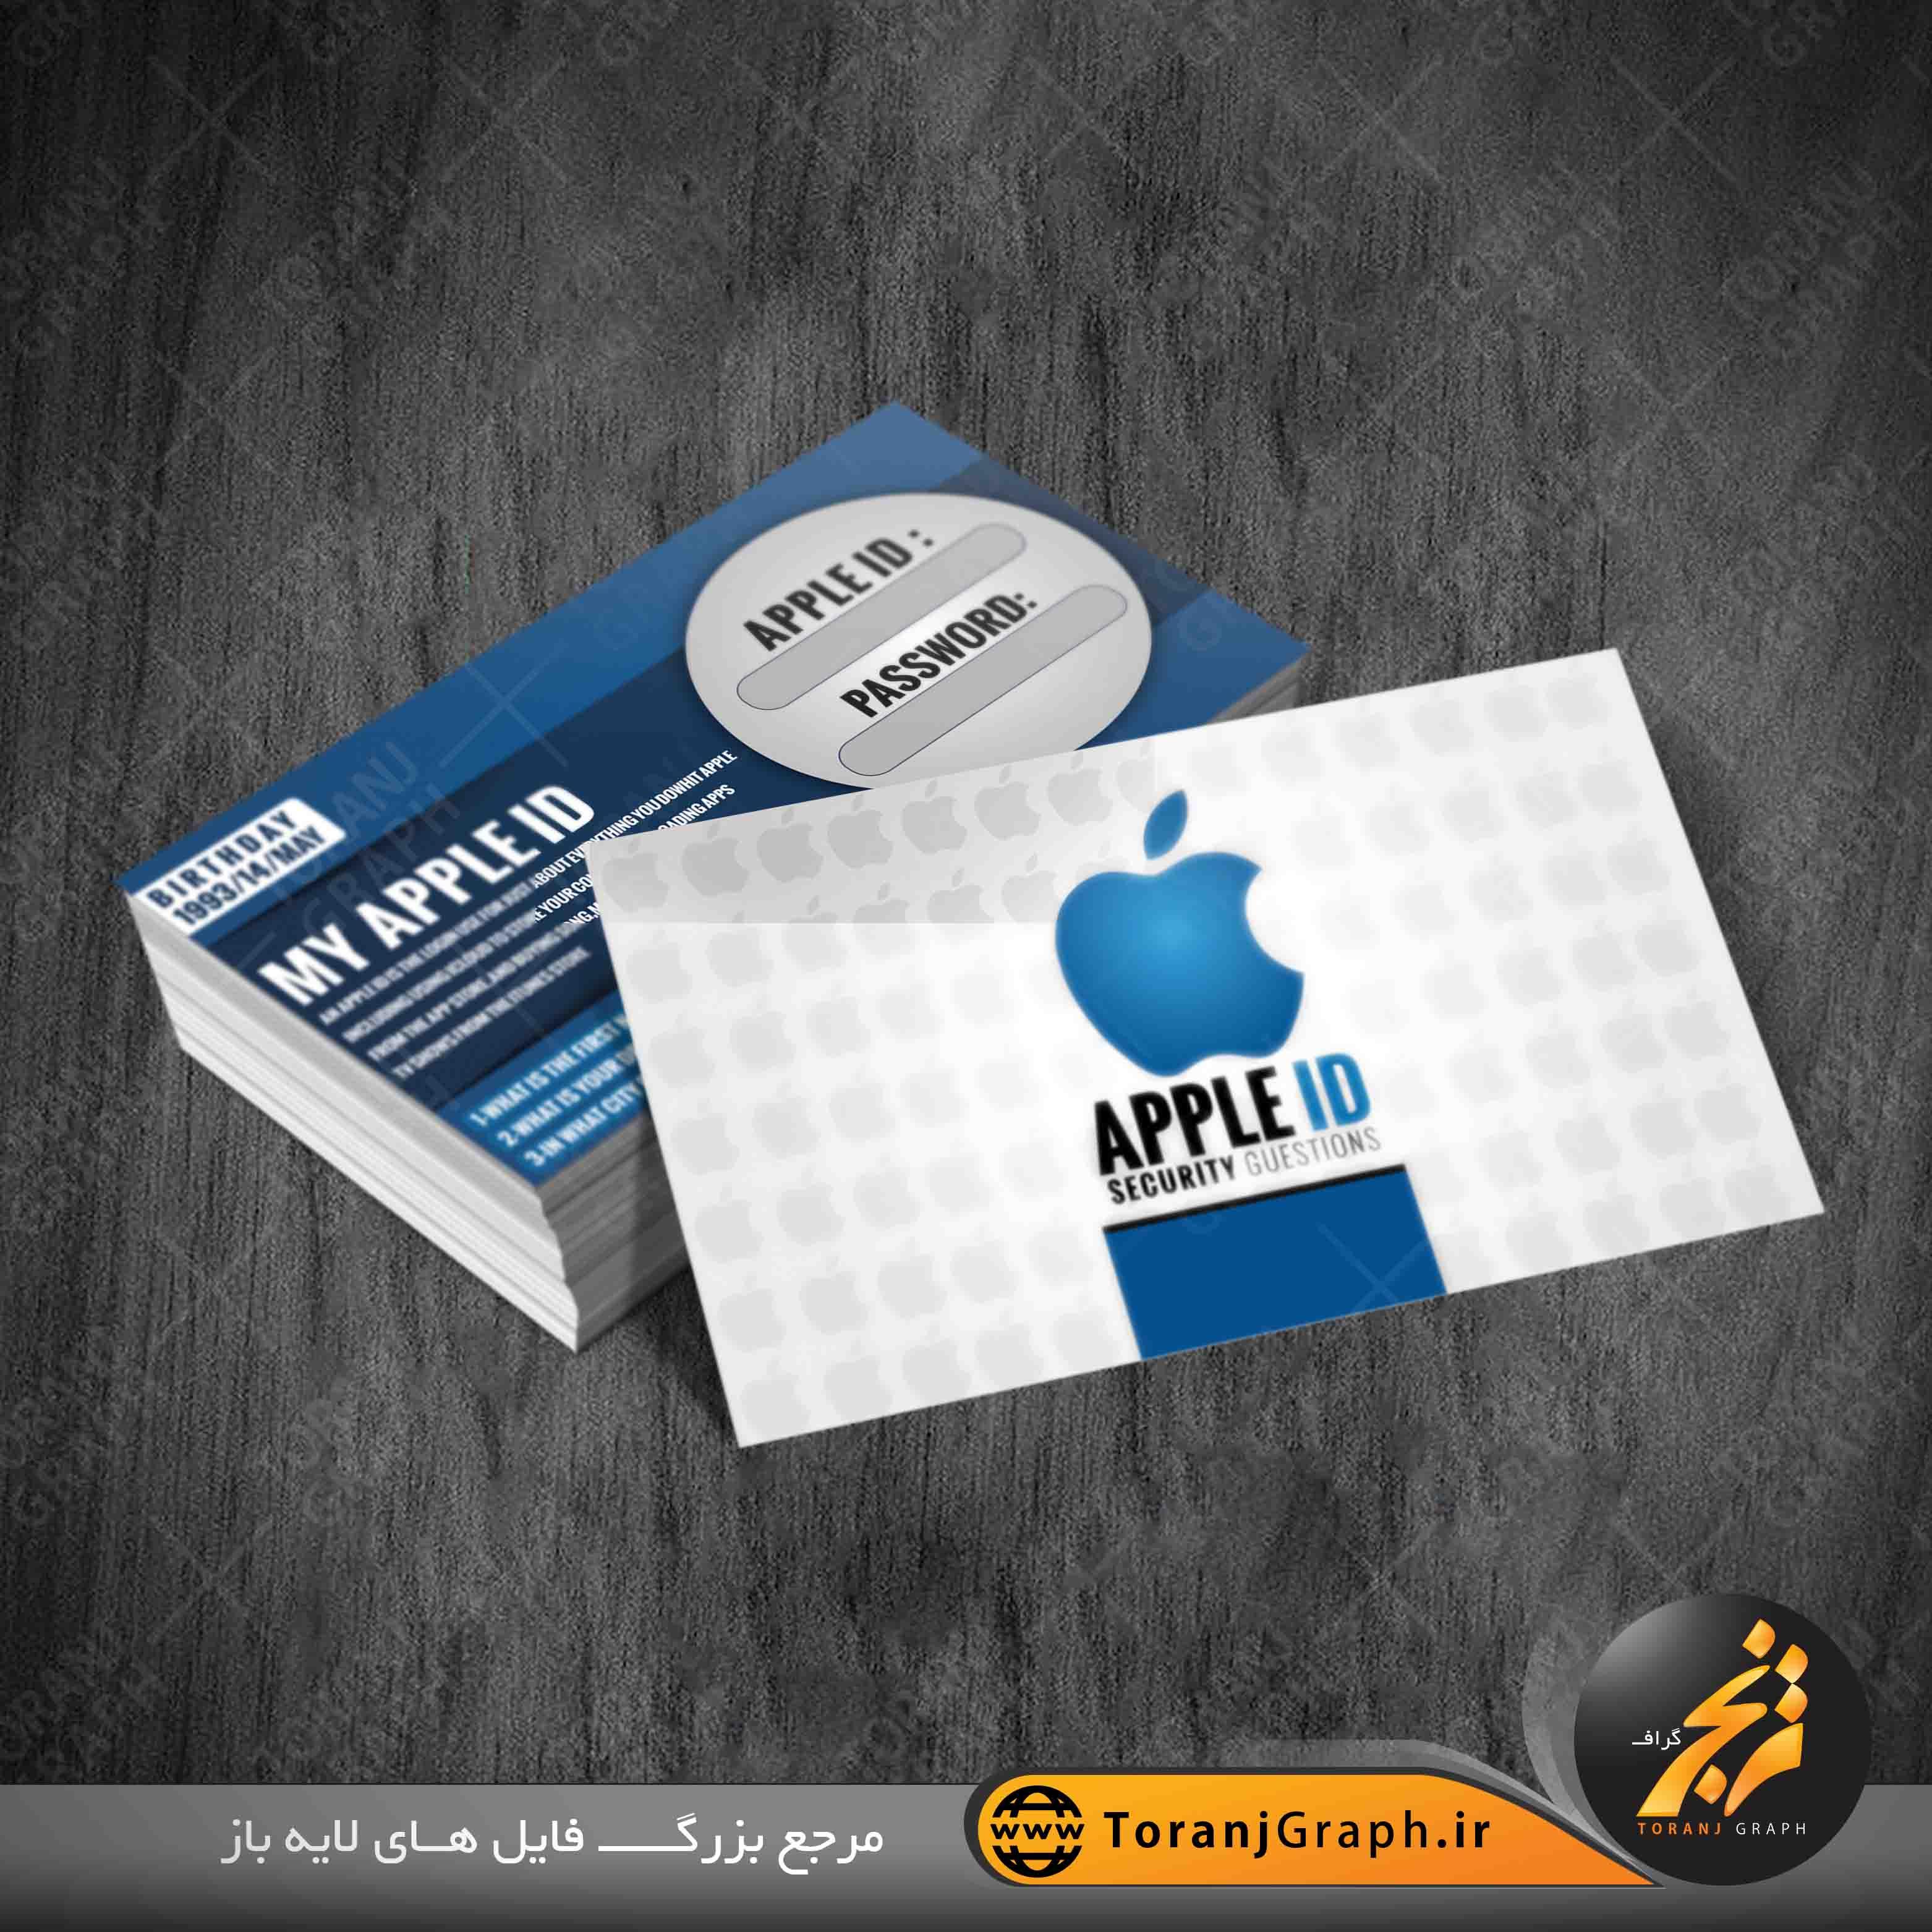 کارت ویزیت لایه باز اپل آی دی (Apple ID)